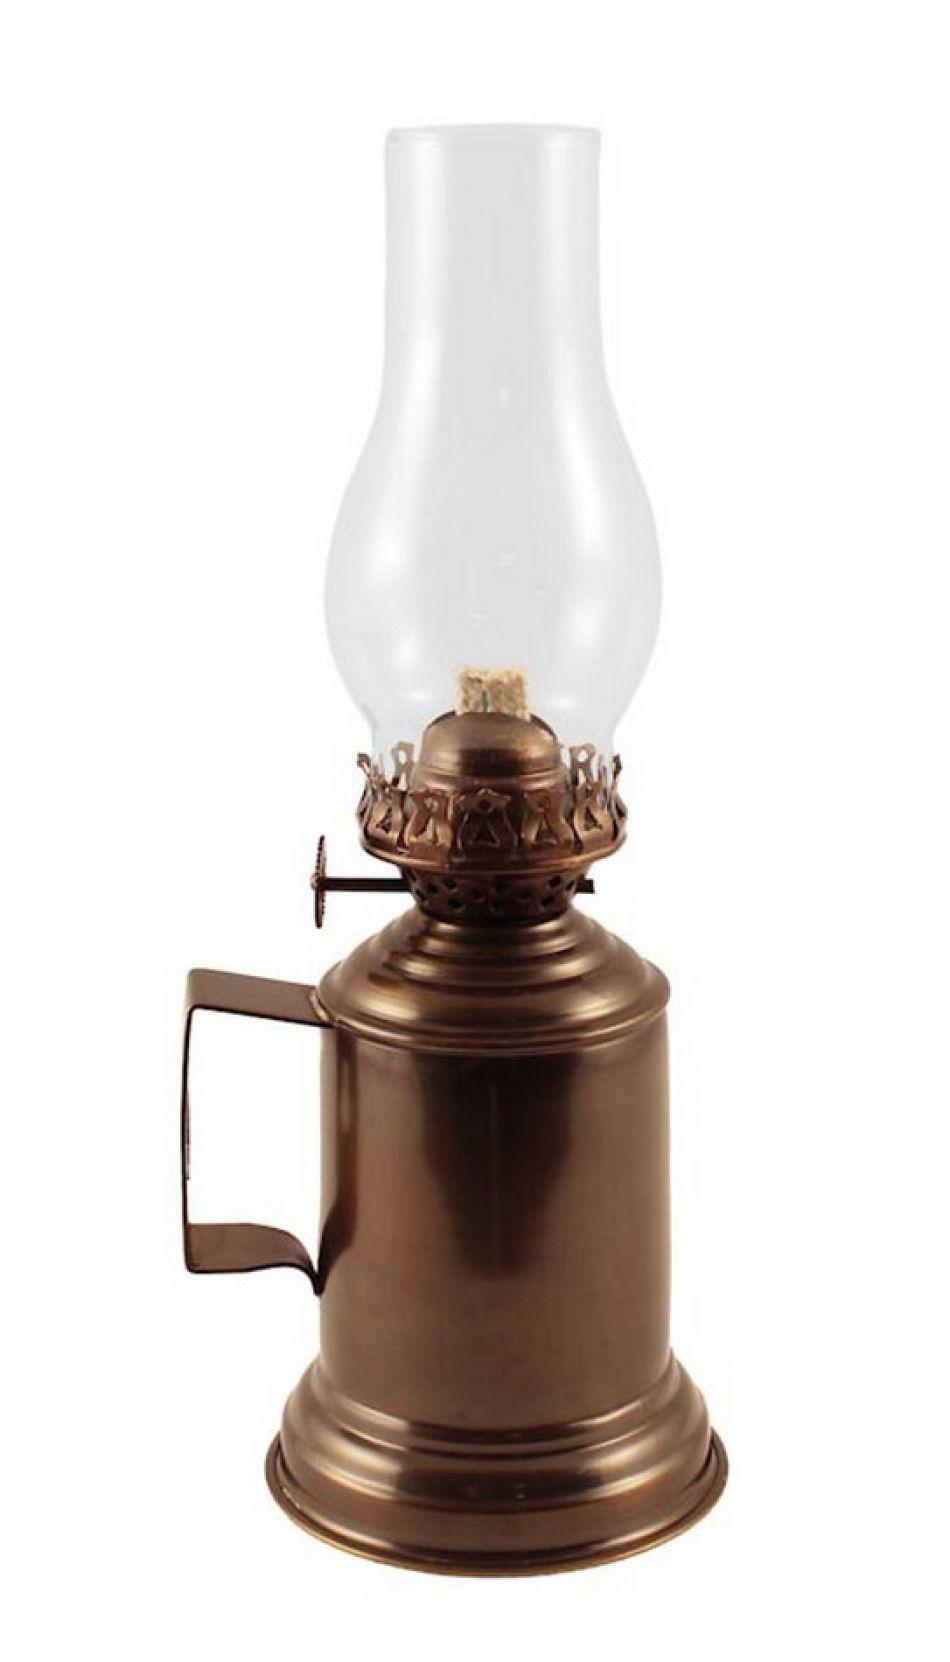 Buy Brass Antique Tavern Mug Oil Lamp 14in Model Ships